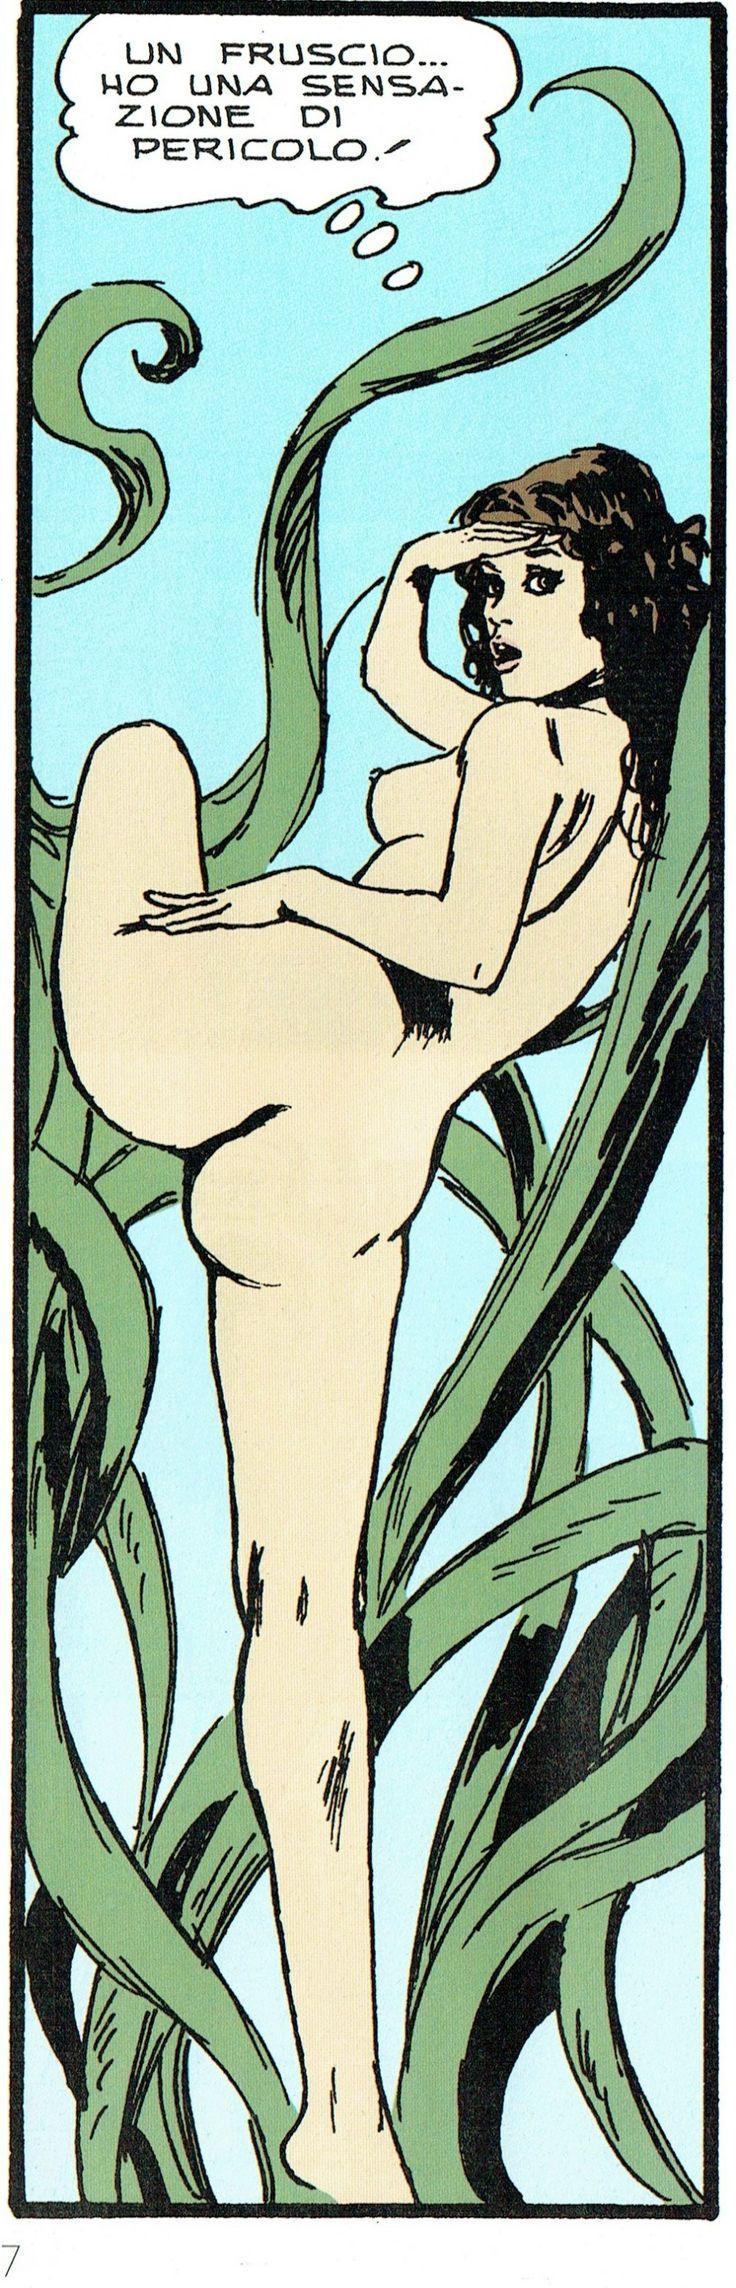 Manara Maestro dell'Eros-Vol. 21, Jolanda De Almaviva-117b